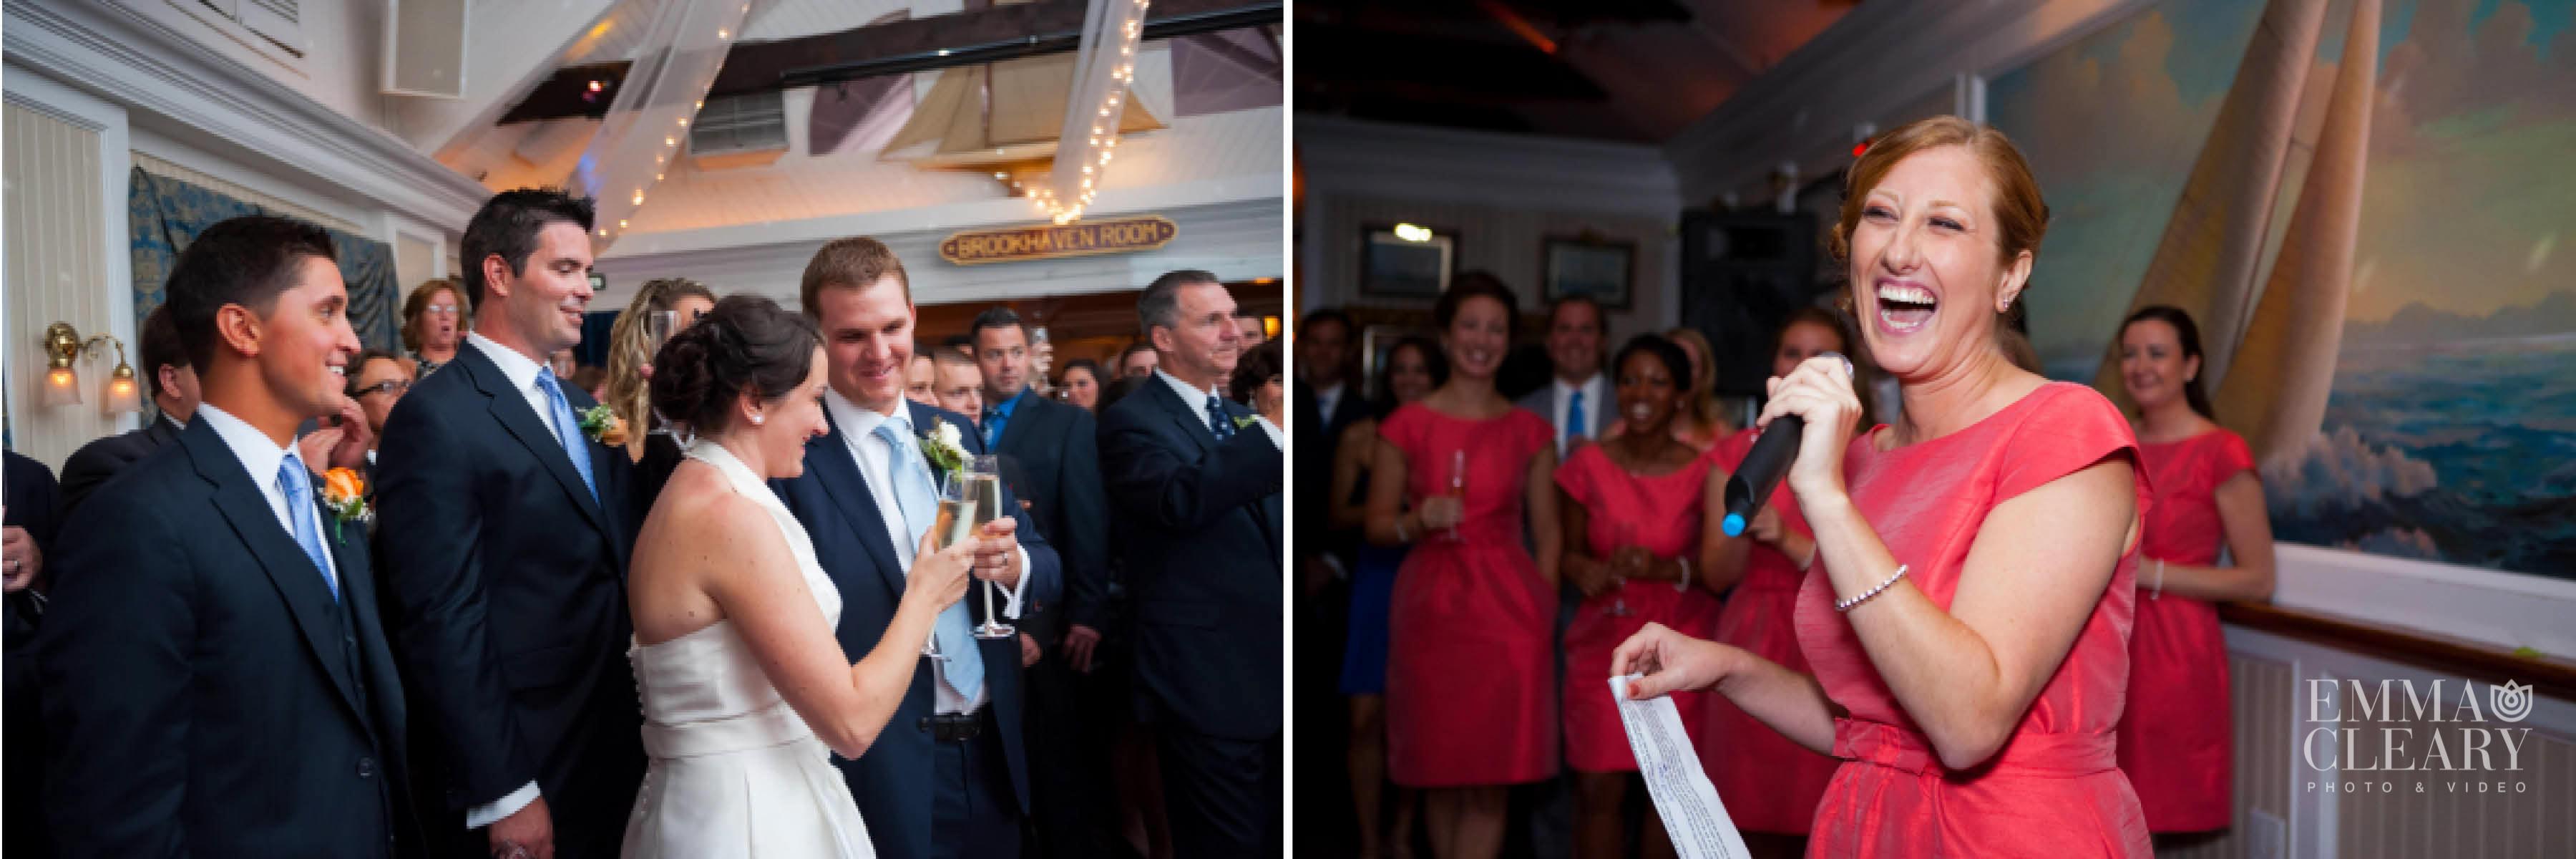 Emma Cleary Photography, Danfords Marina wedding24